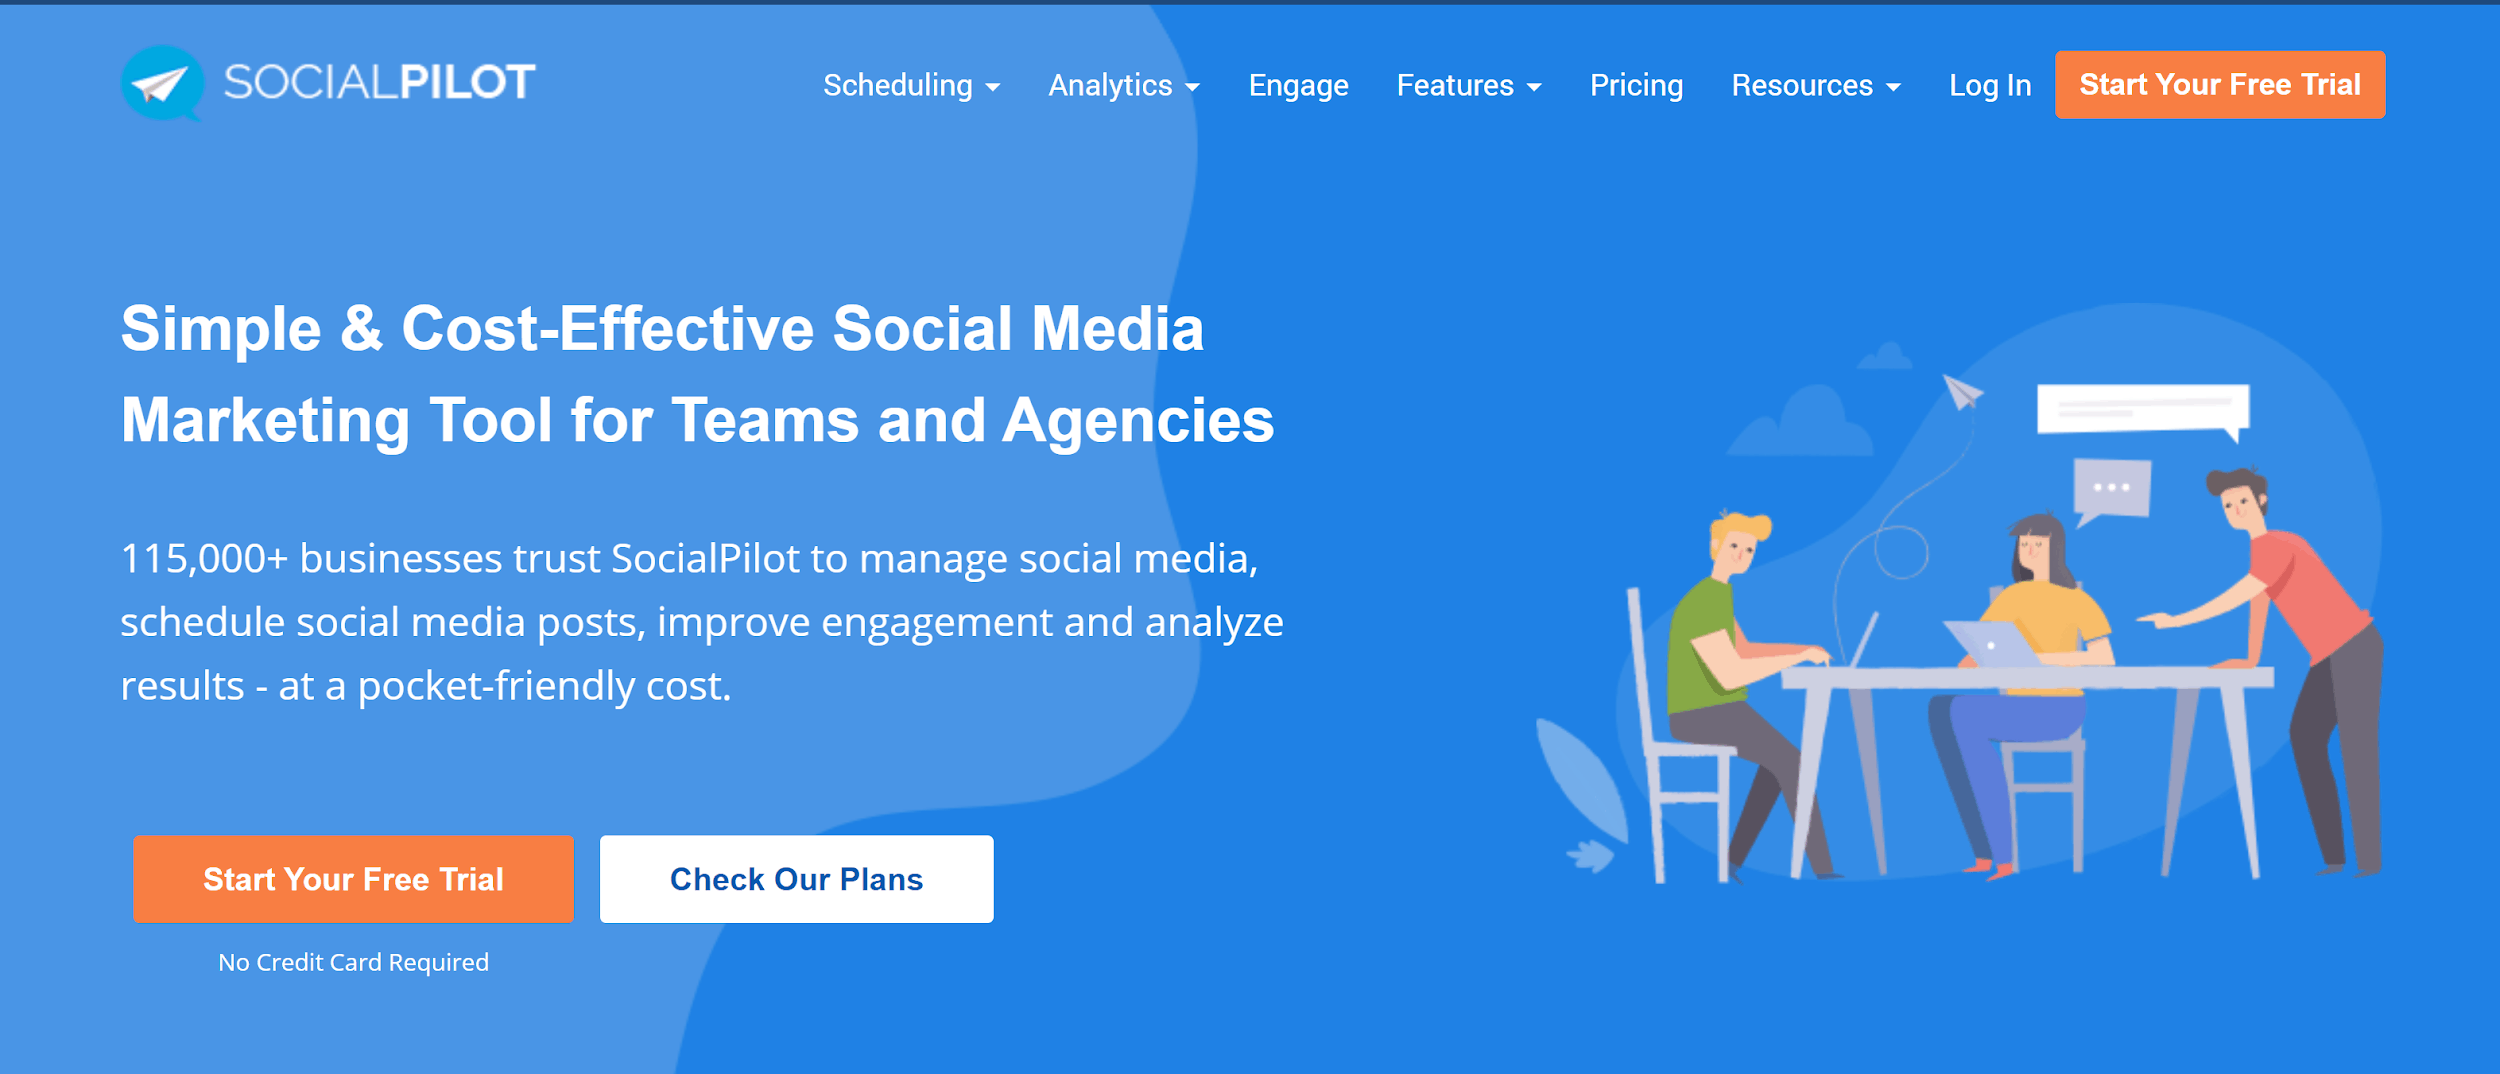 socialpilot-overview1